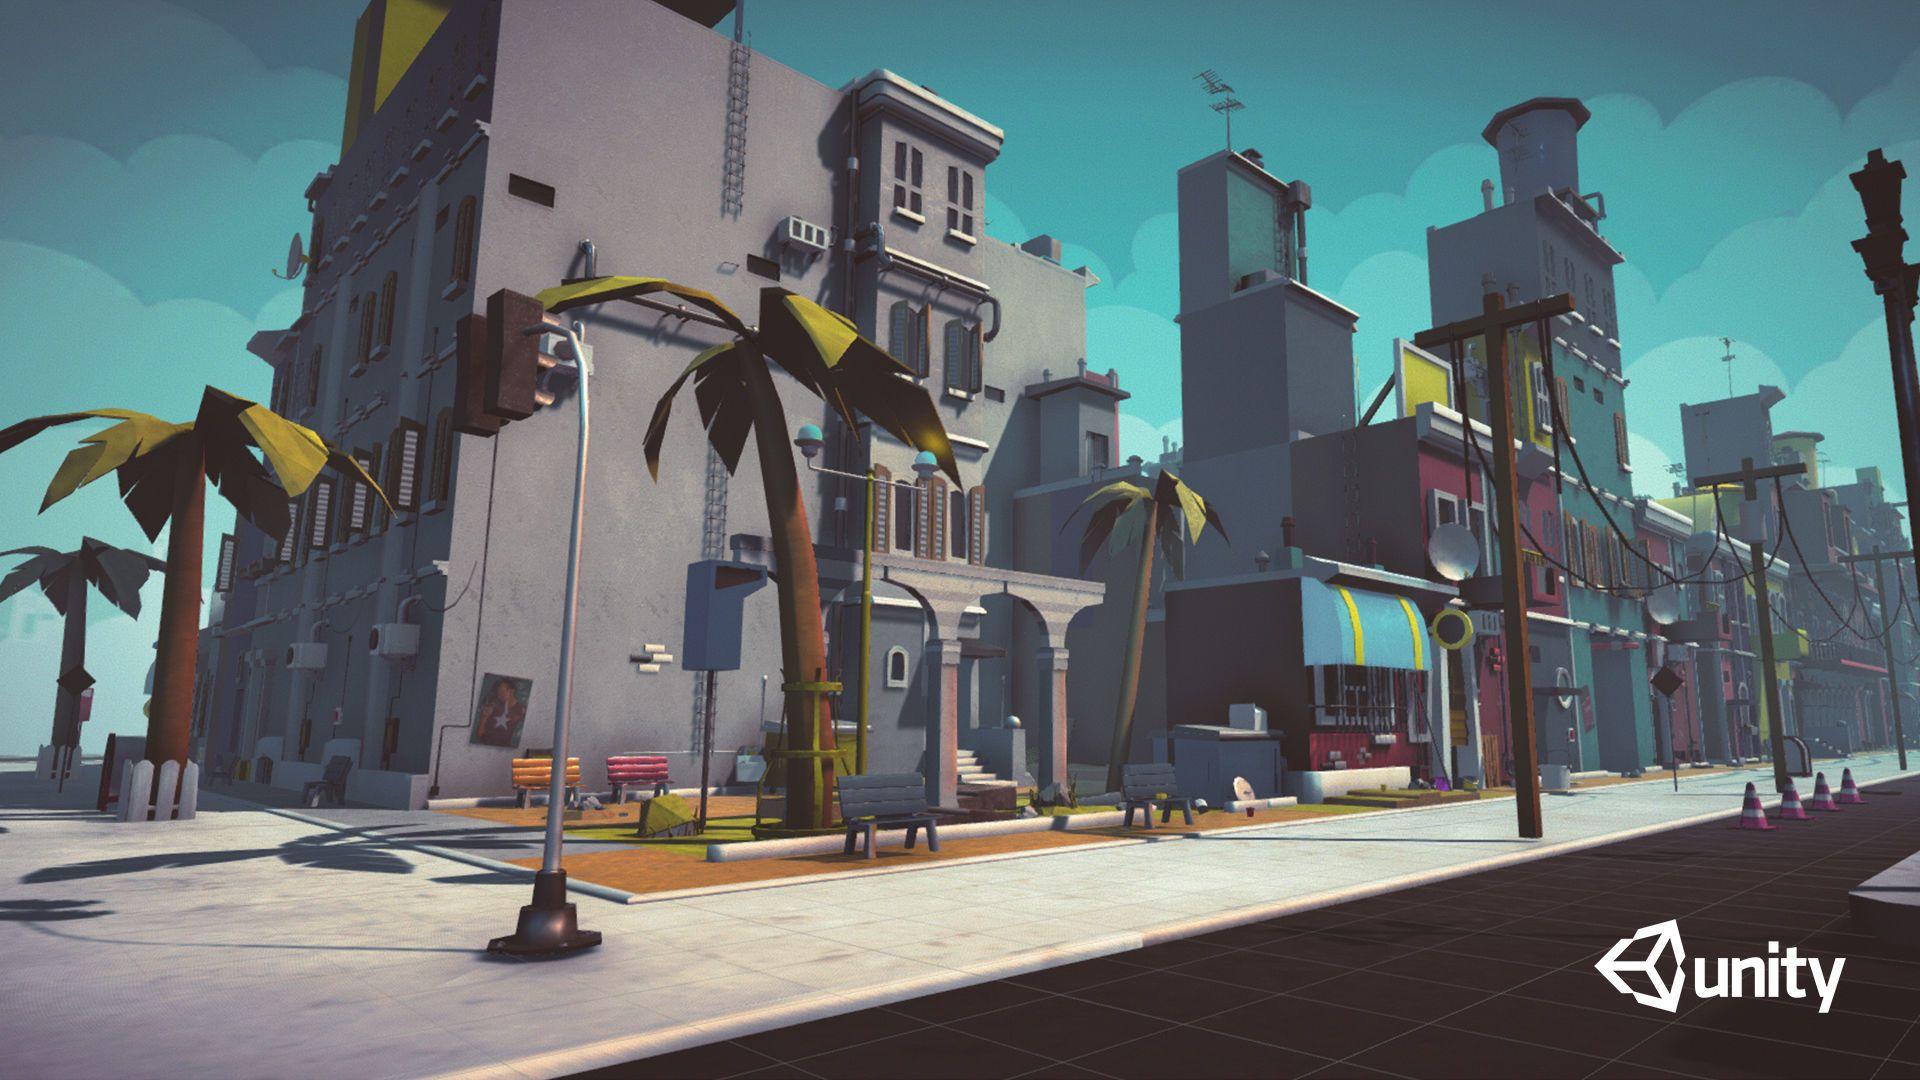 Cartoon low poly modular city pack 3d model obj 3ds fbx blend dae